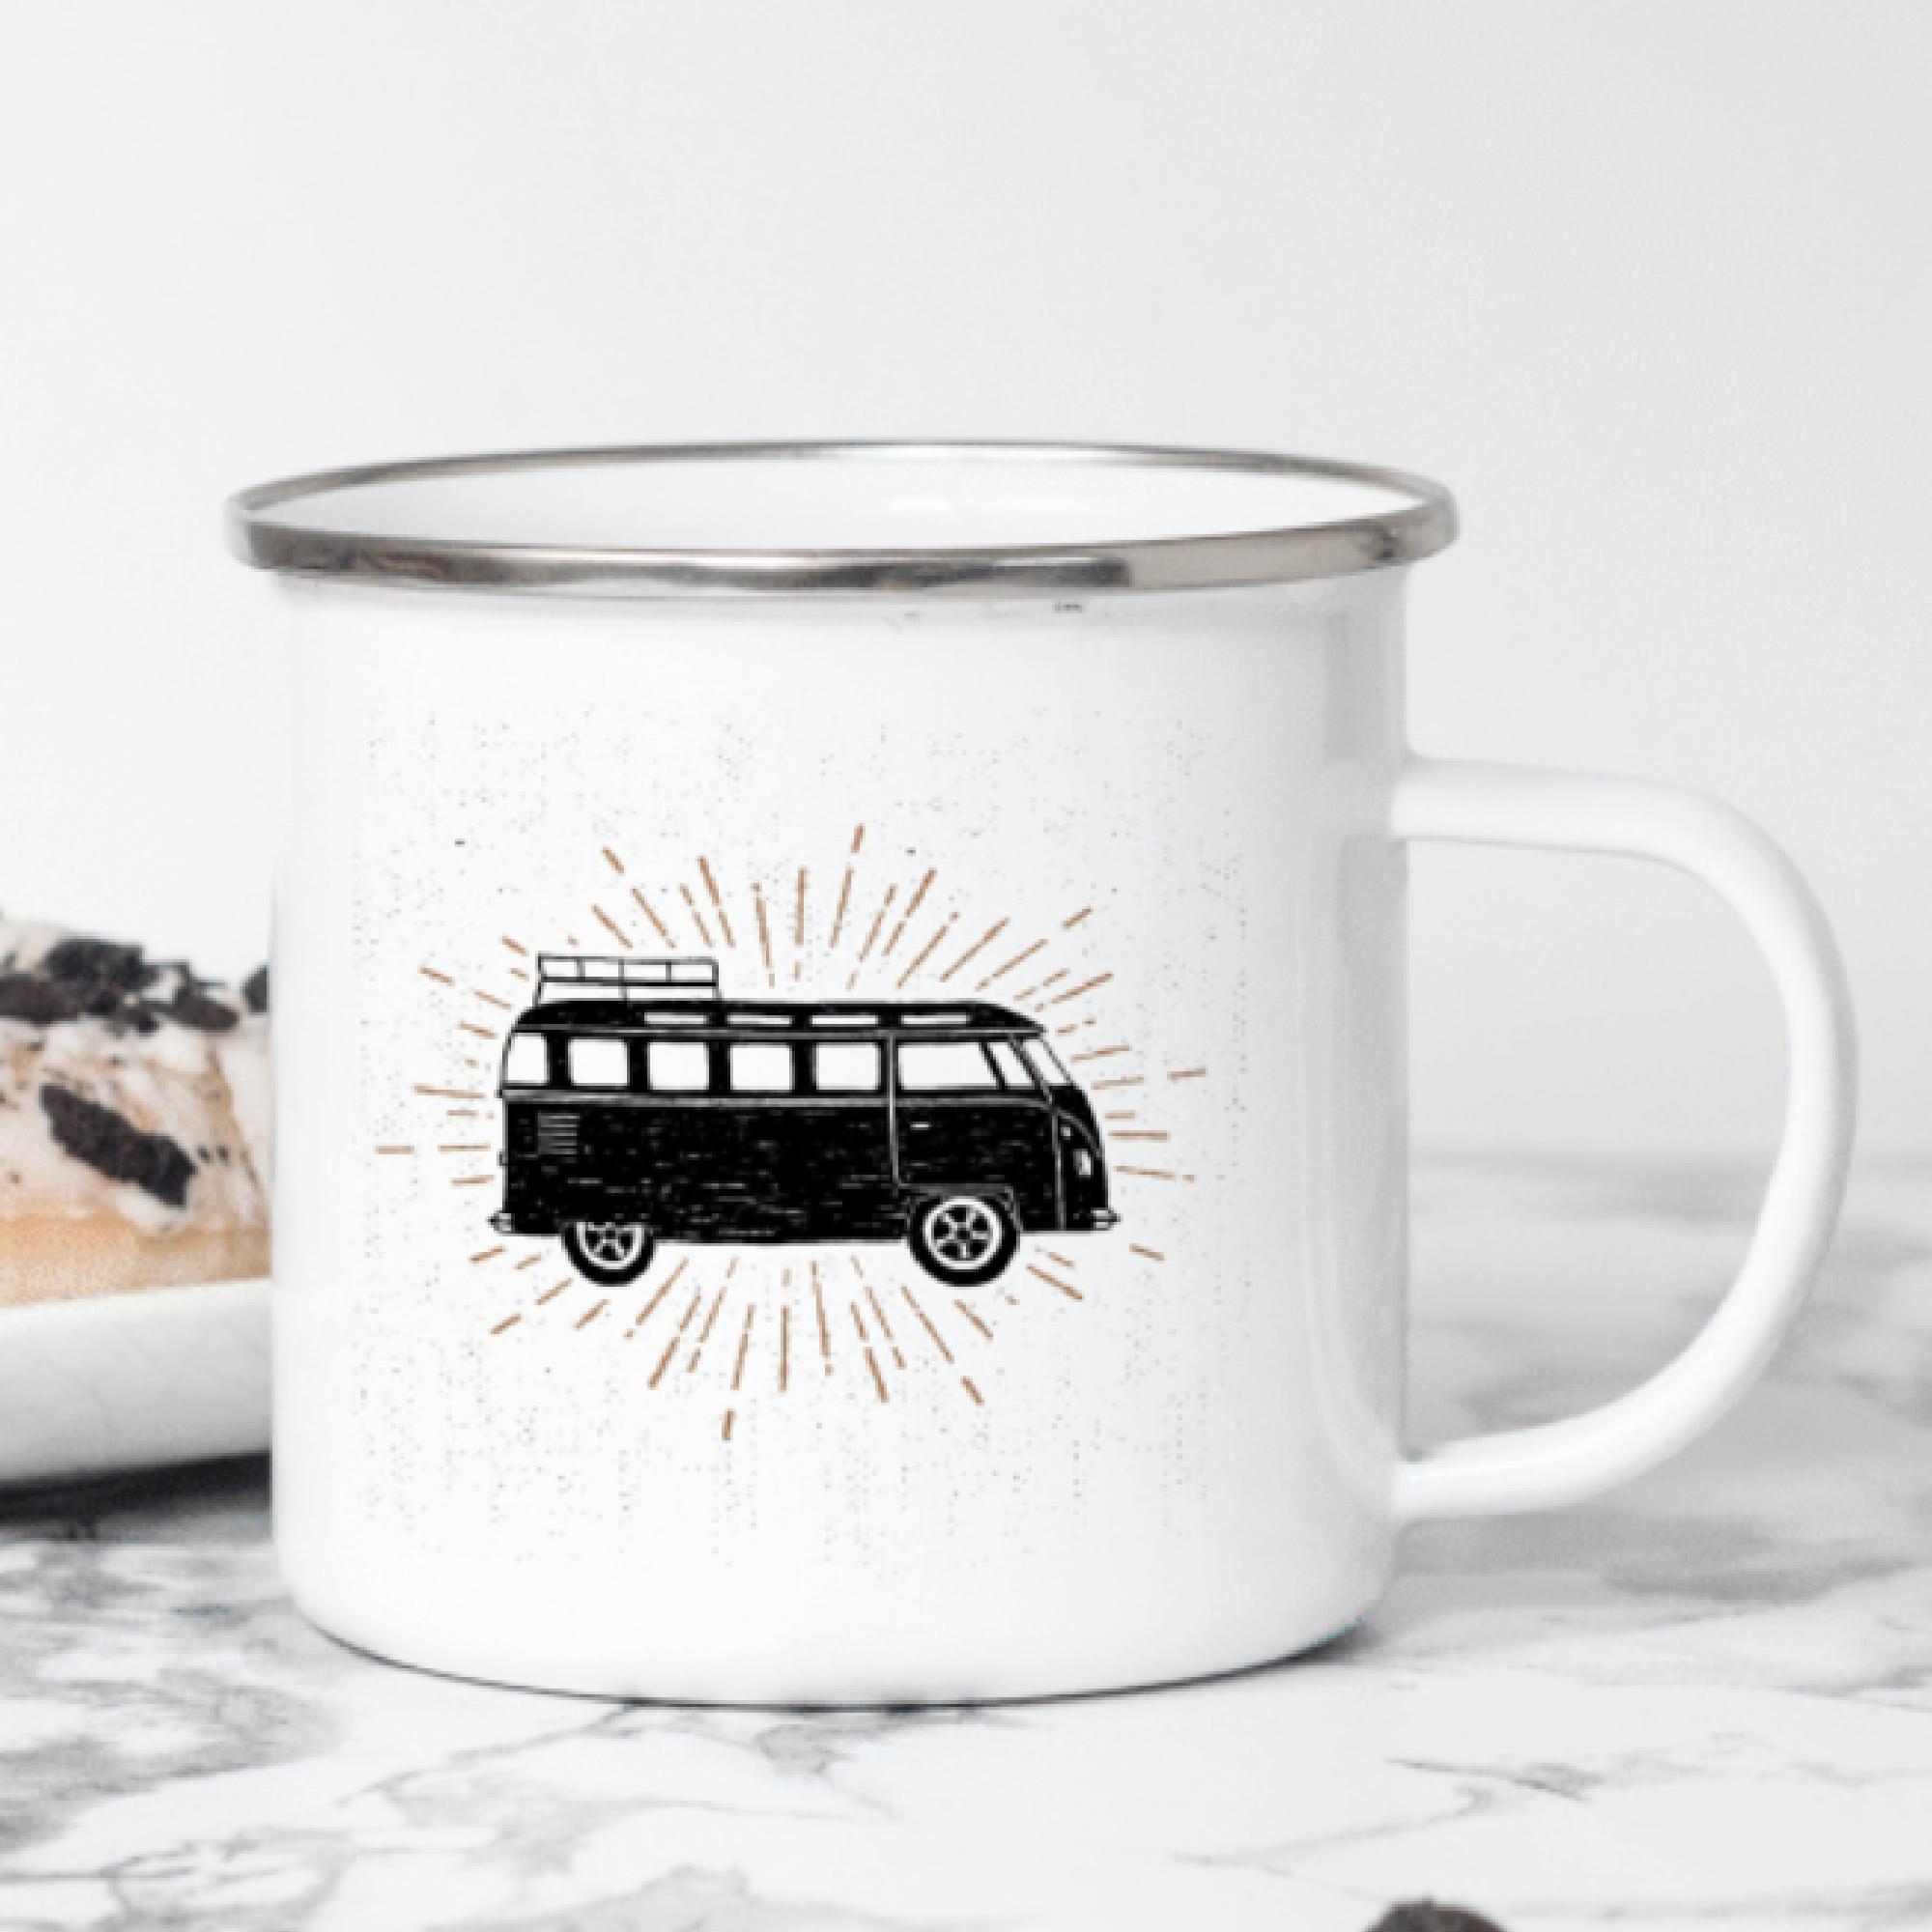 Camping / Van Life Enamel Mugs